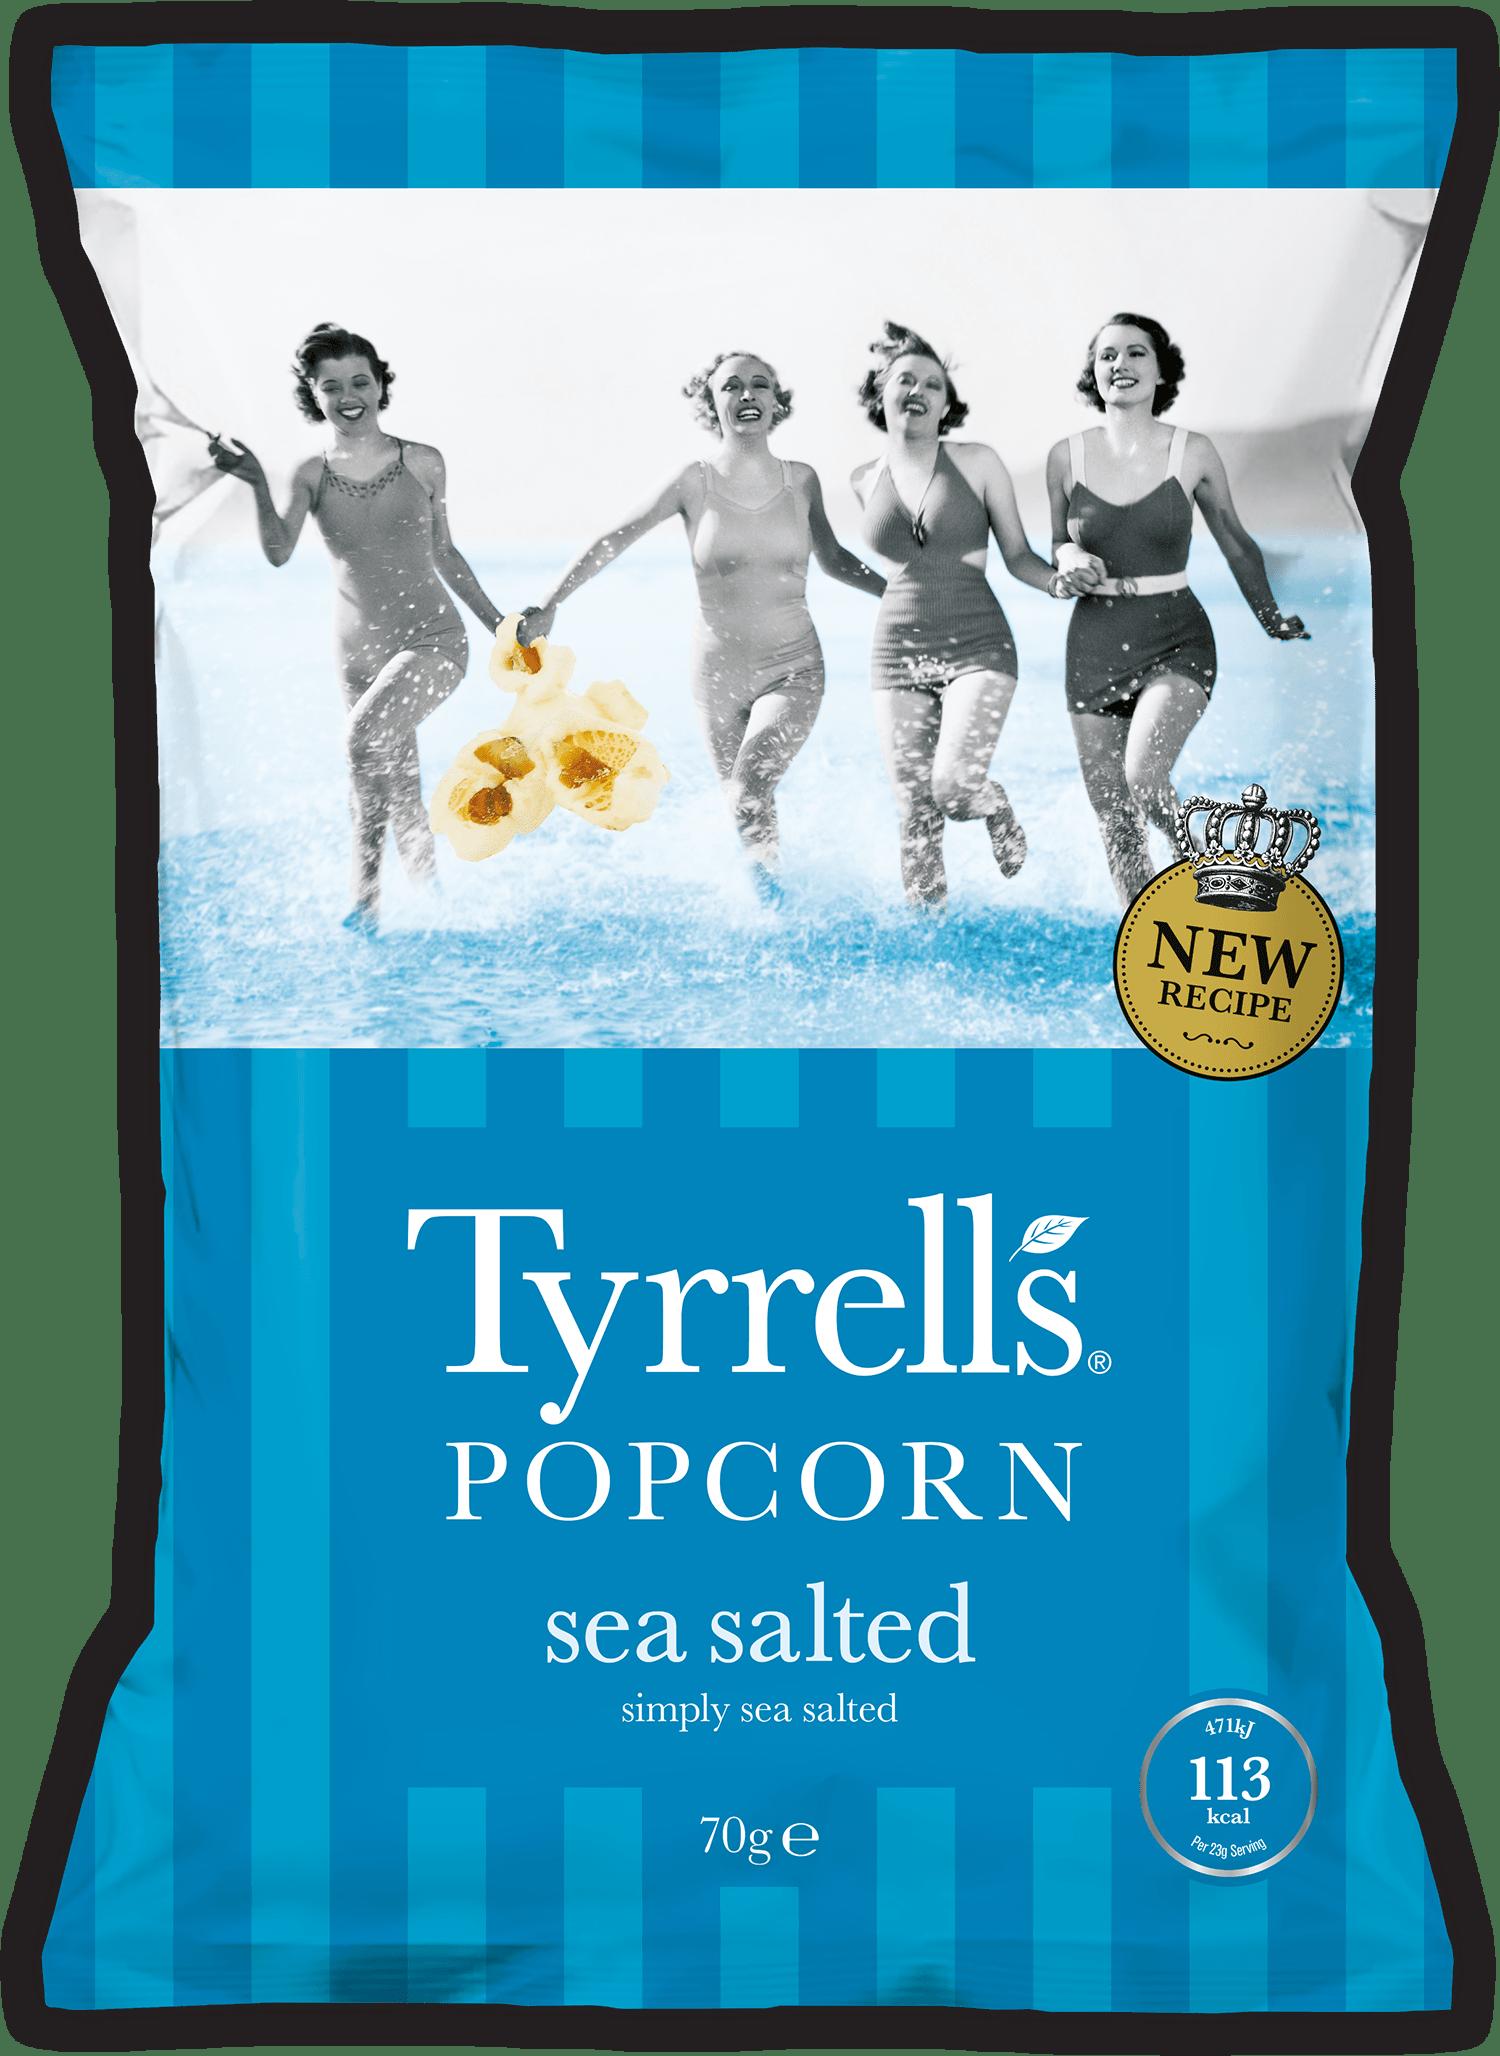 Sea Salted Popcorn